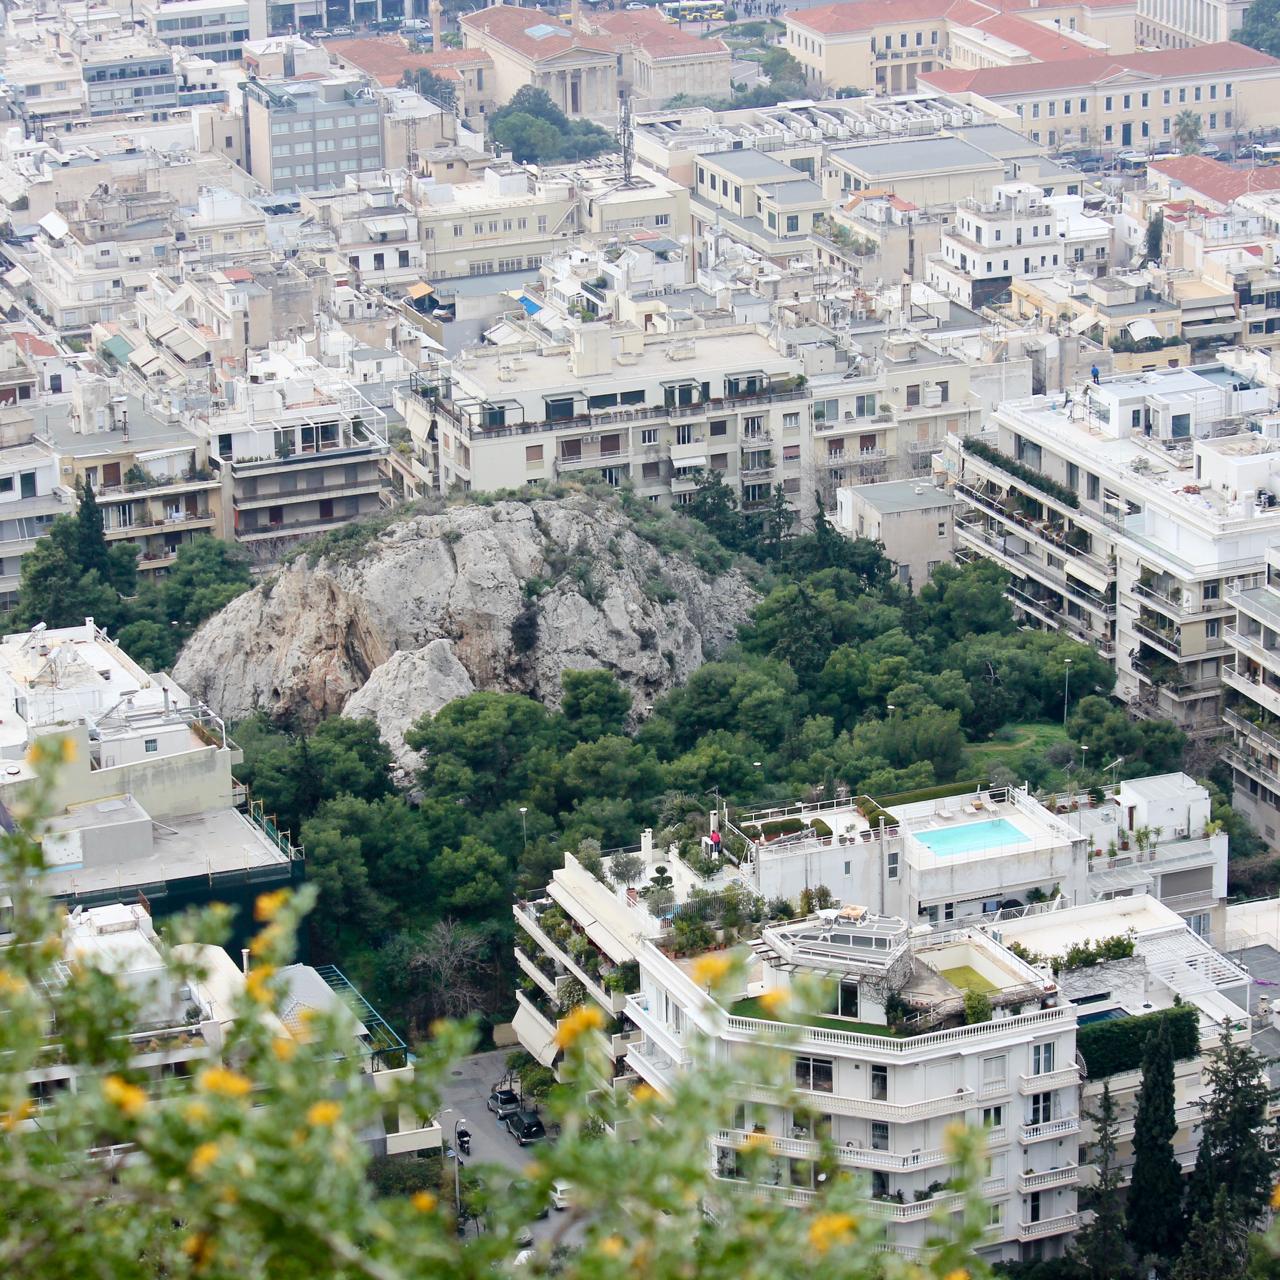 Athens, Greece - 30